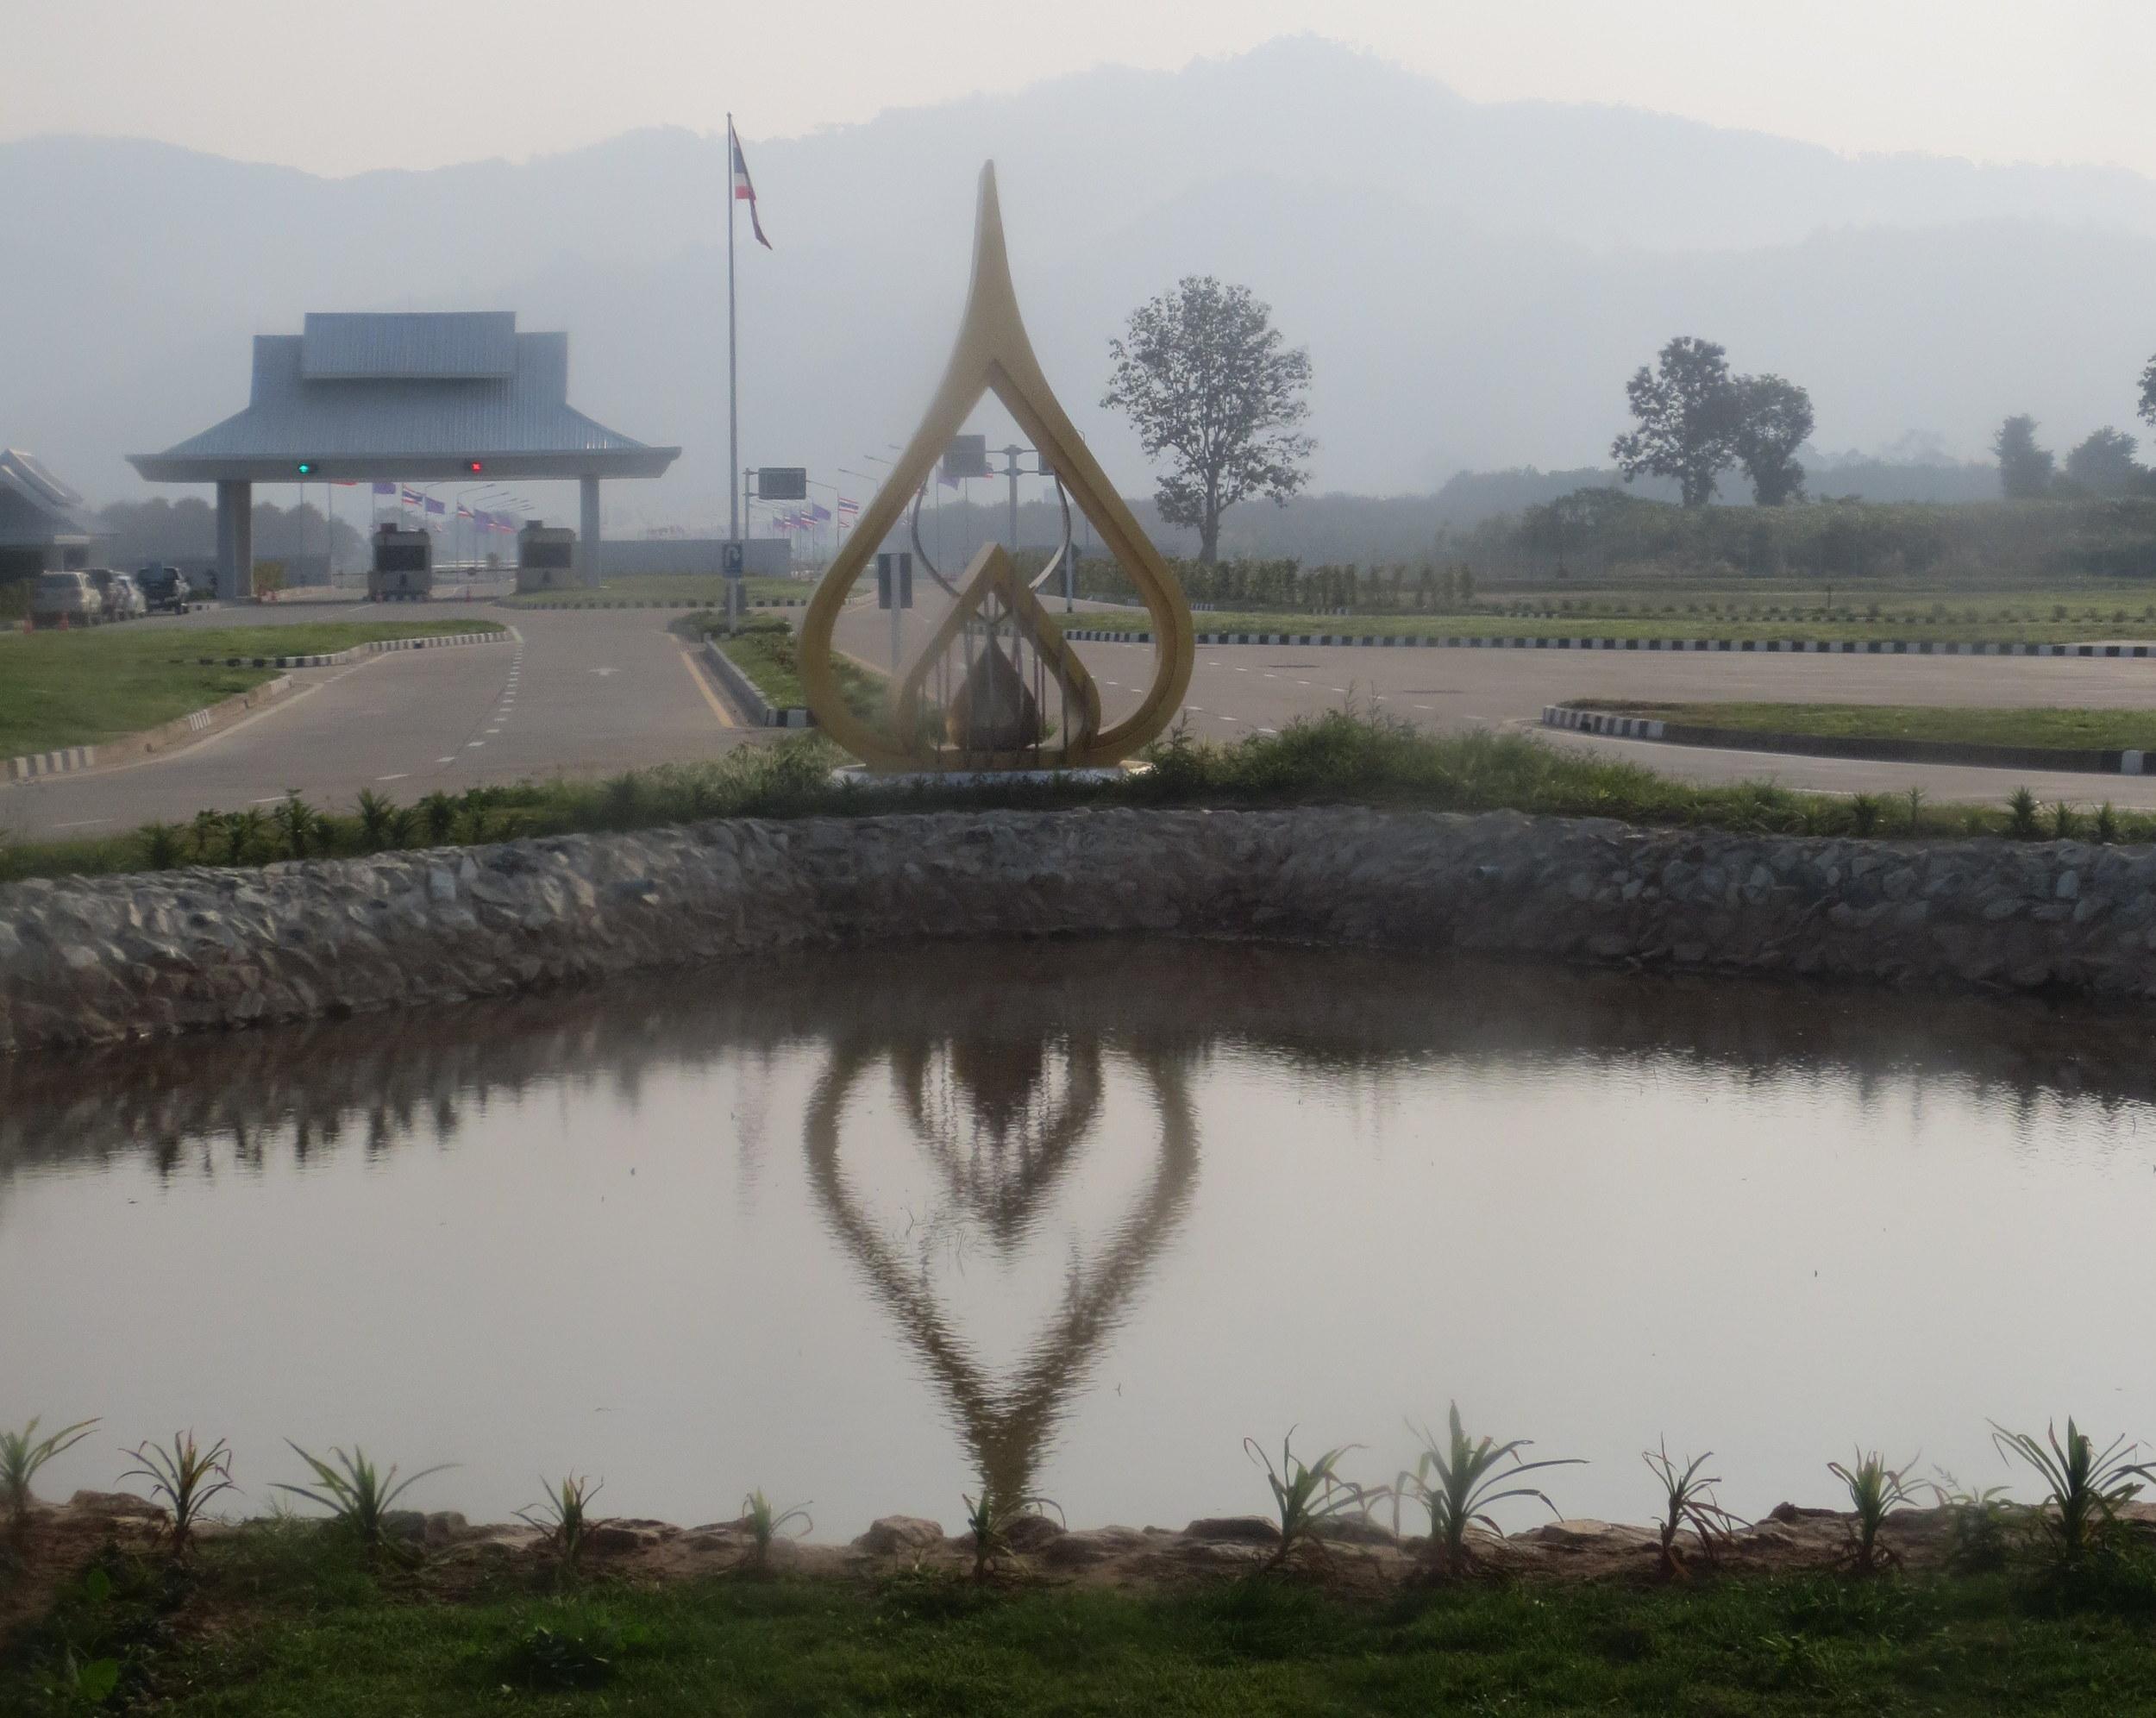 Laos/Thailand Friendship Bridge - Border Crossing